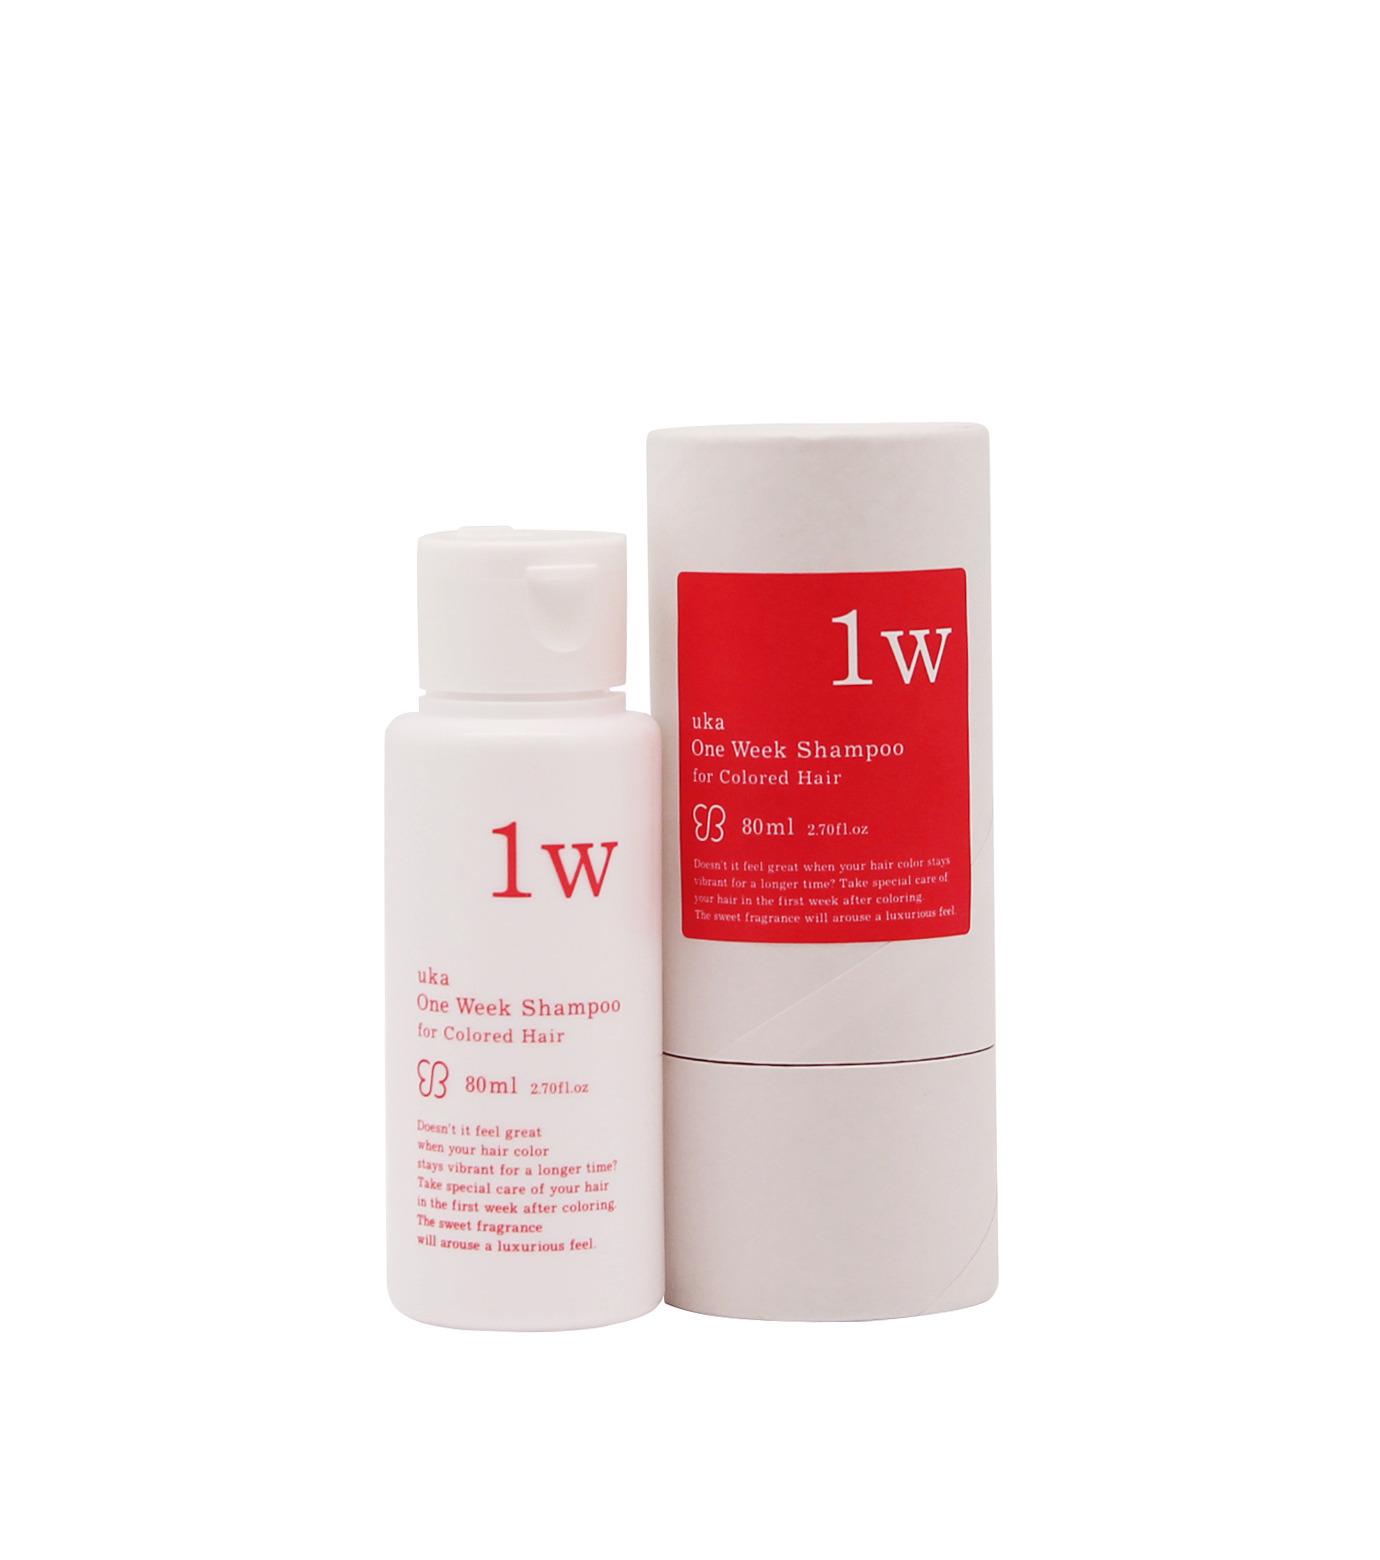 uka(ウカ)のOne Week Shampoo for Colored Hair-WHITE(HAIR-CARE/HAIR-CARE)-3000148-4 拡大詳細画像1